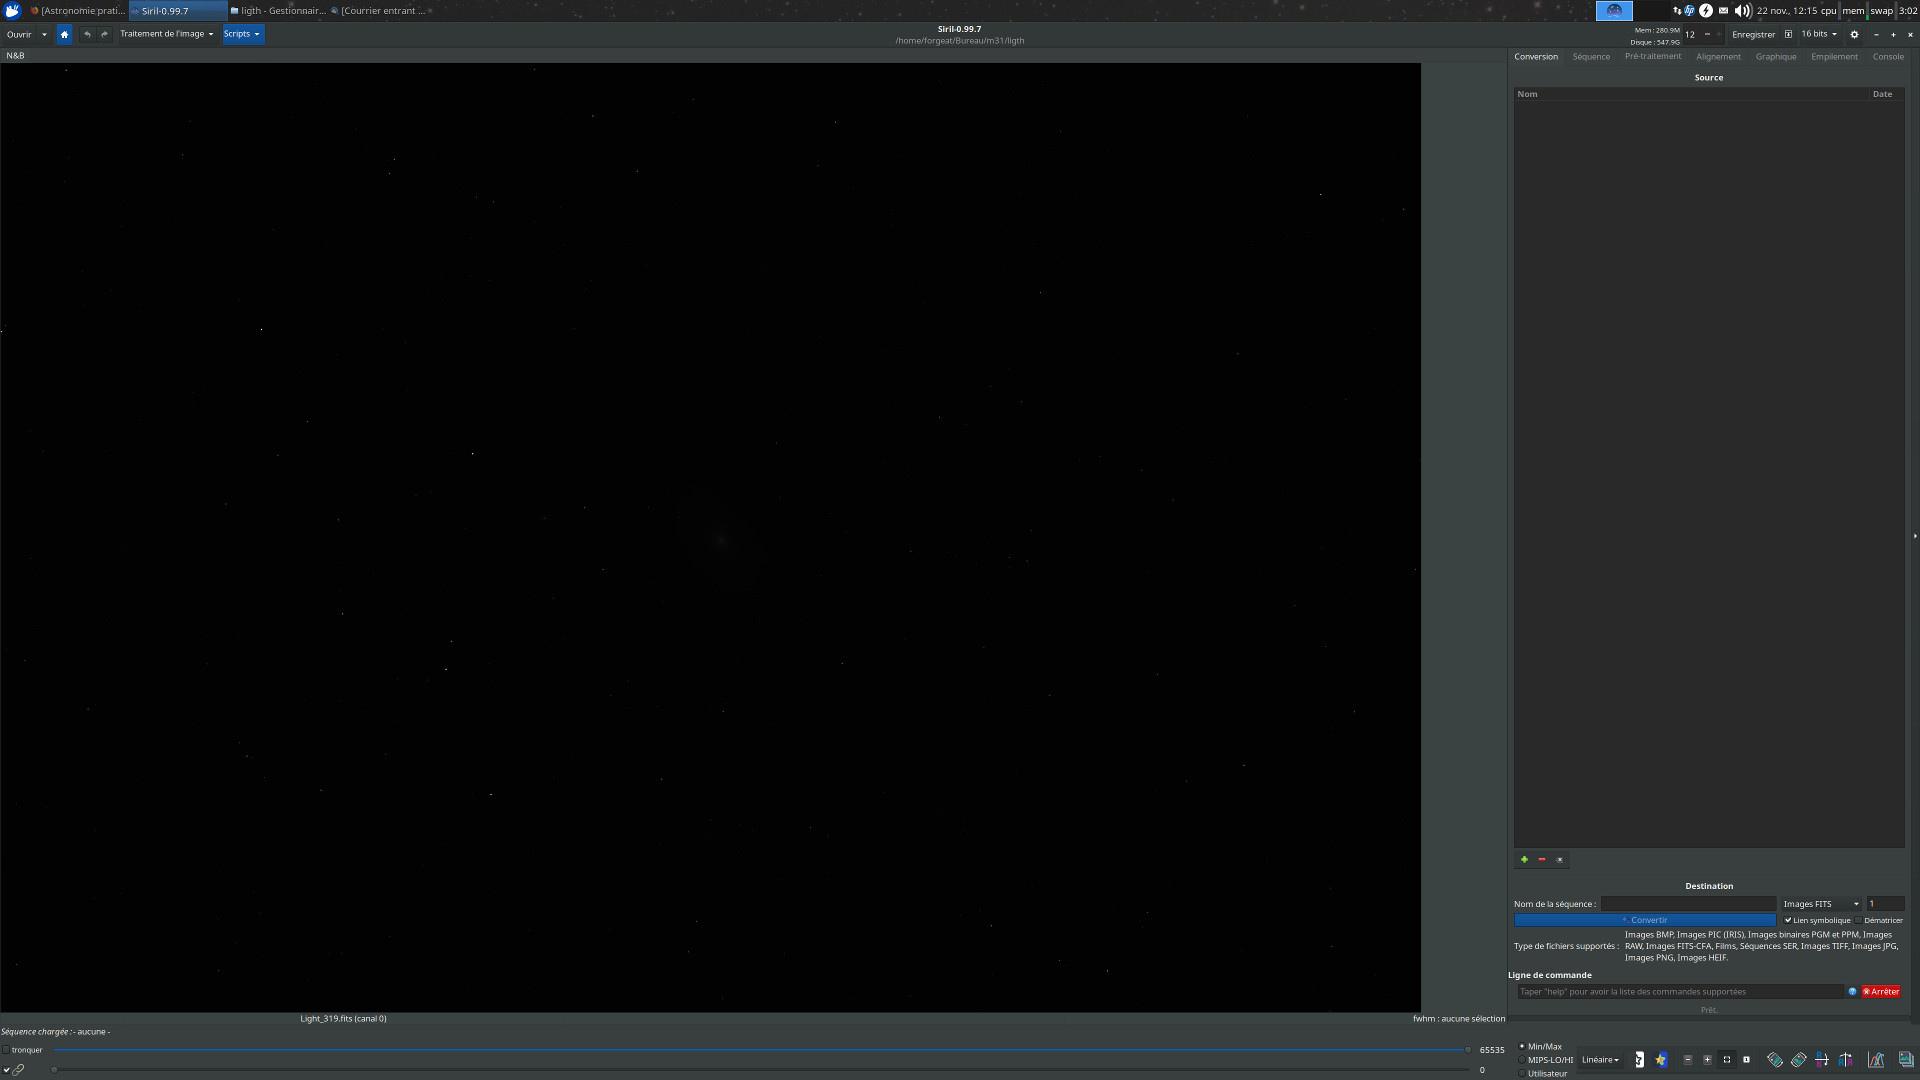 m31-lineaire.jpg.ddf3e1d2bd8c394554e6739c8765124d.jpg